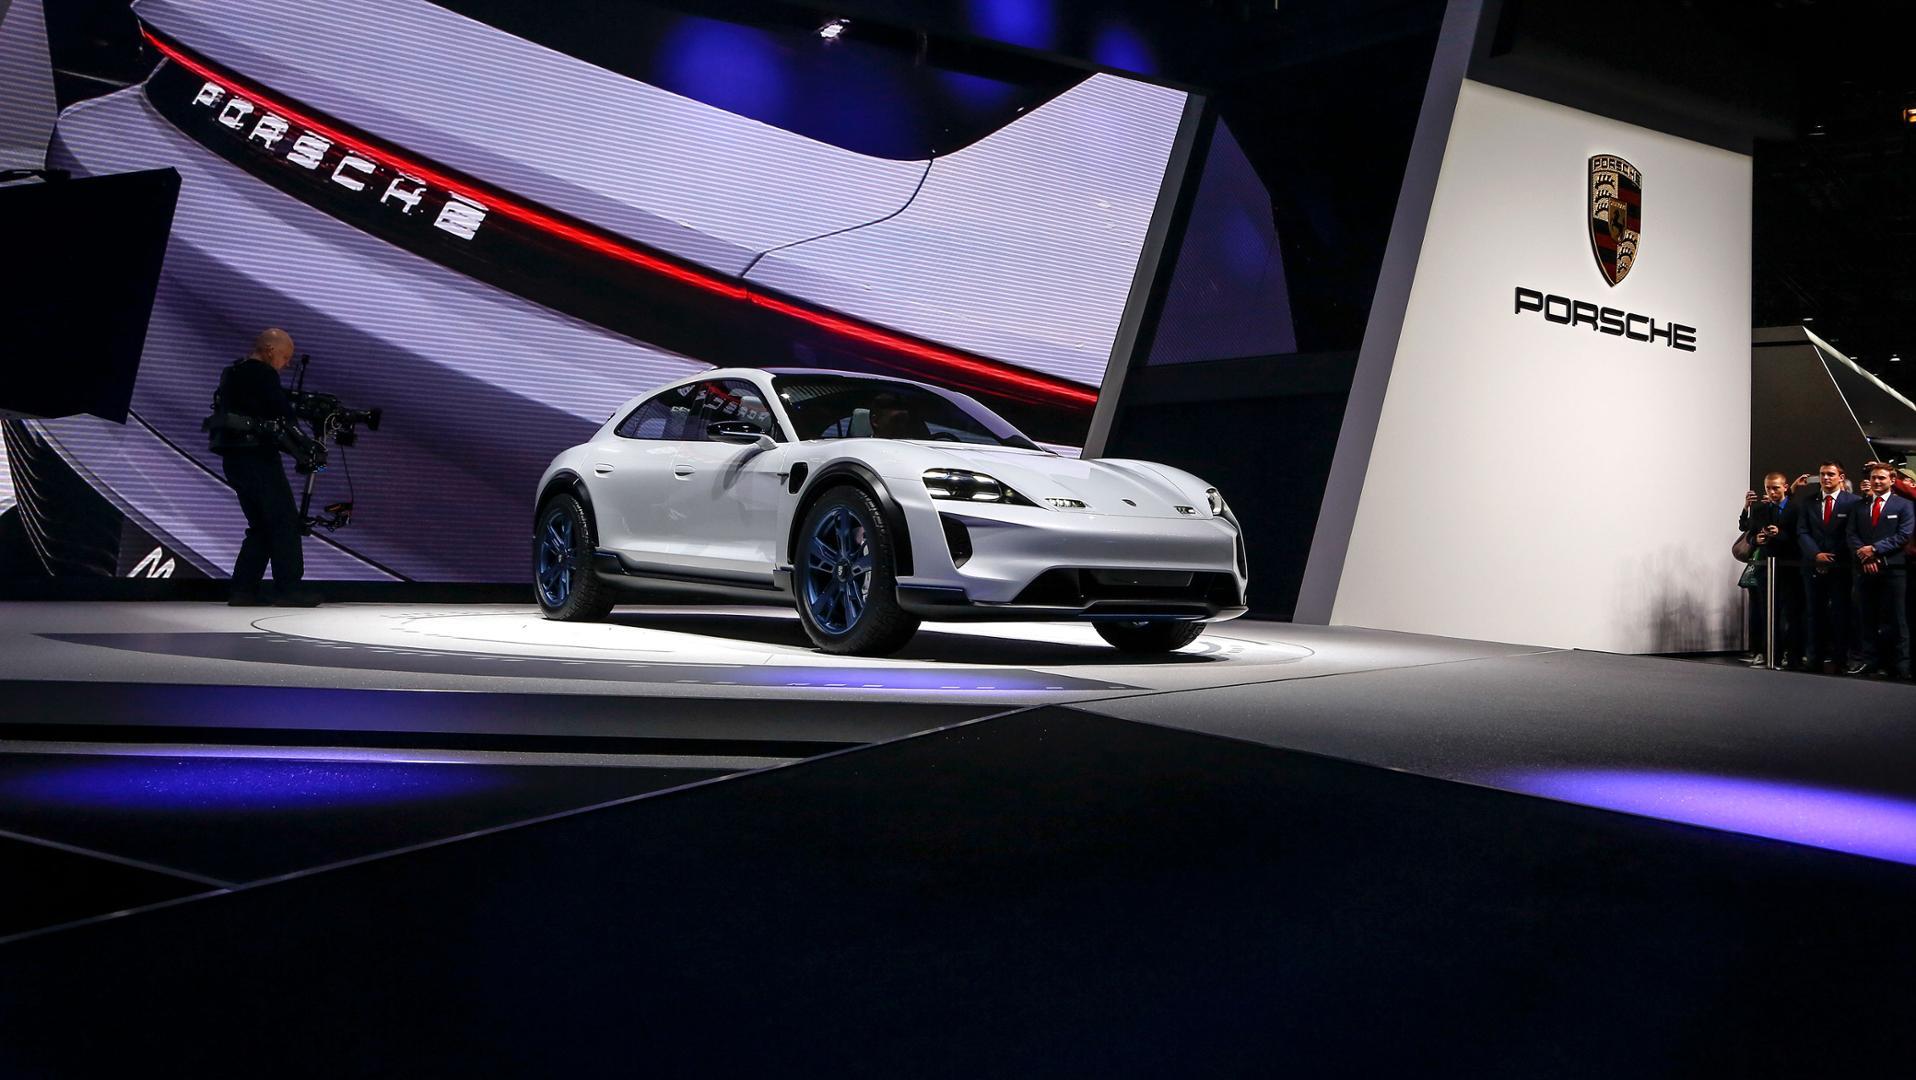 Porsche Mission E CUV var en populære modell under bilmessen.